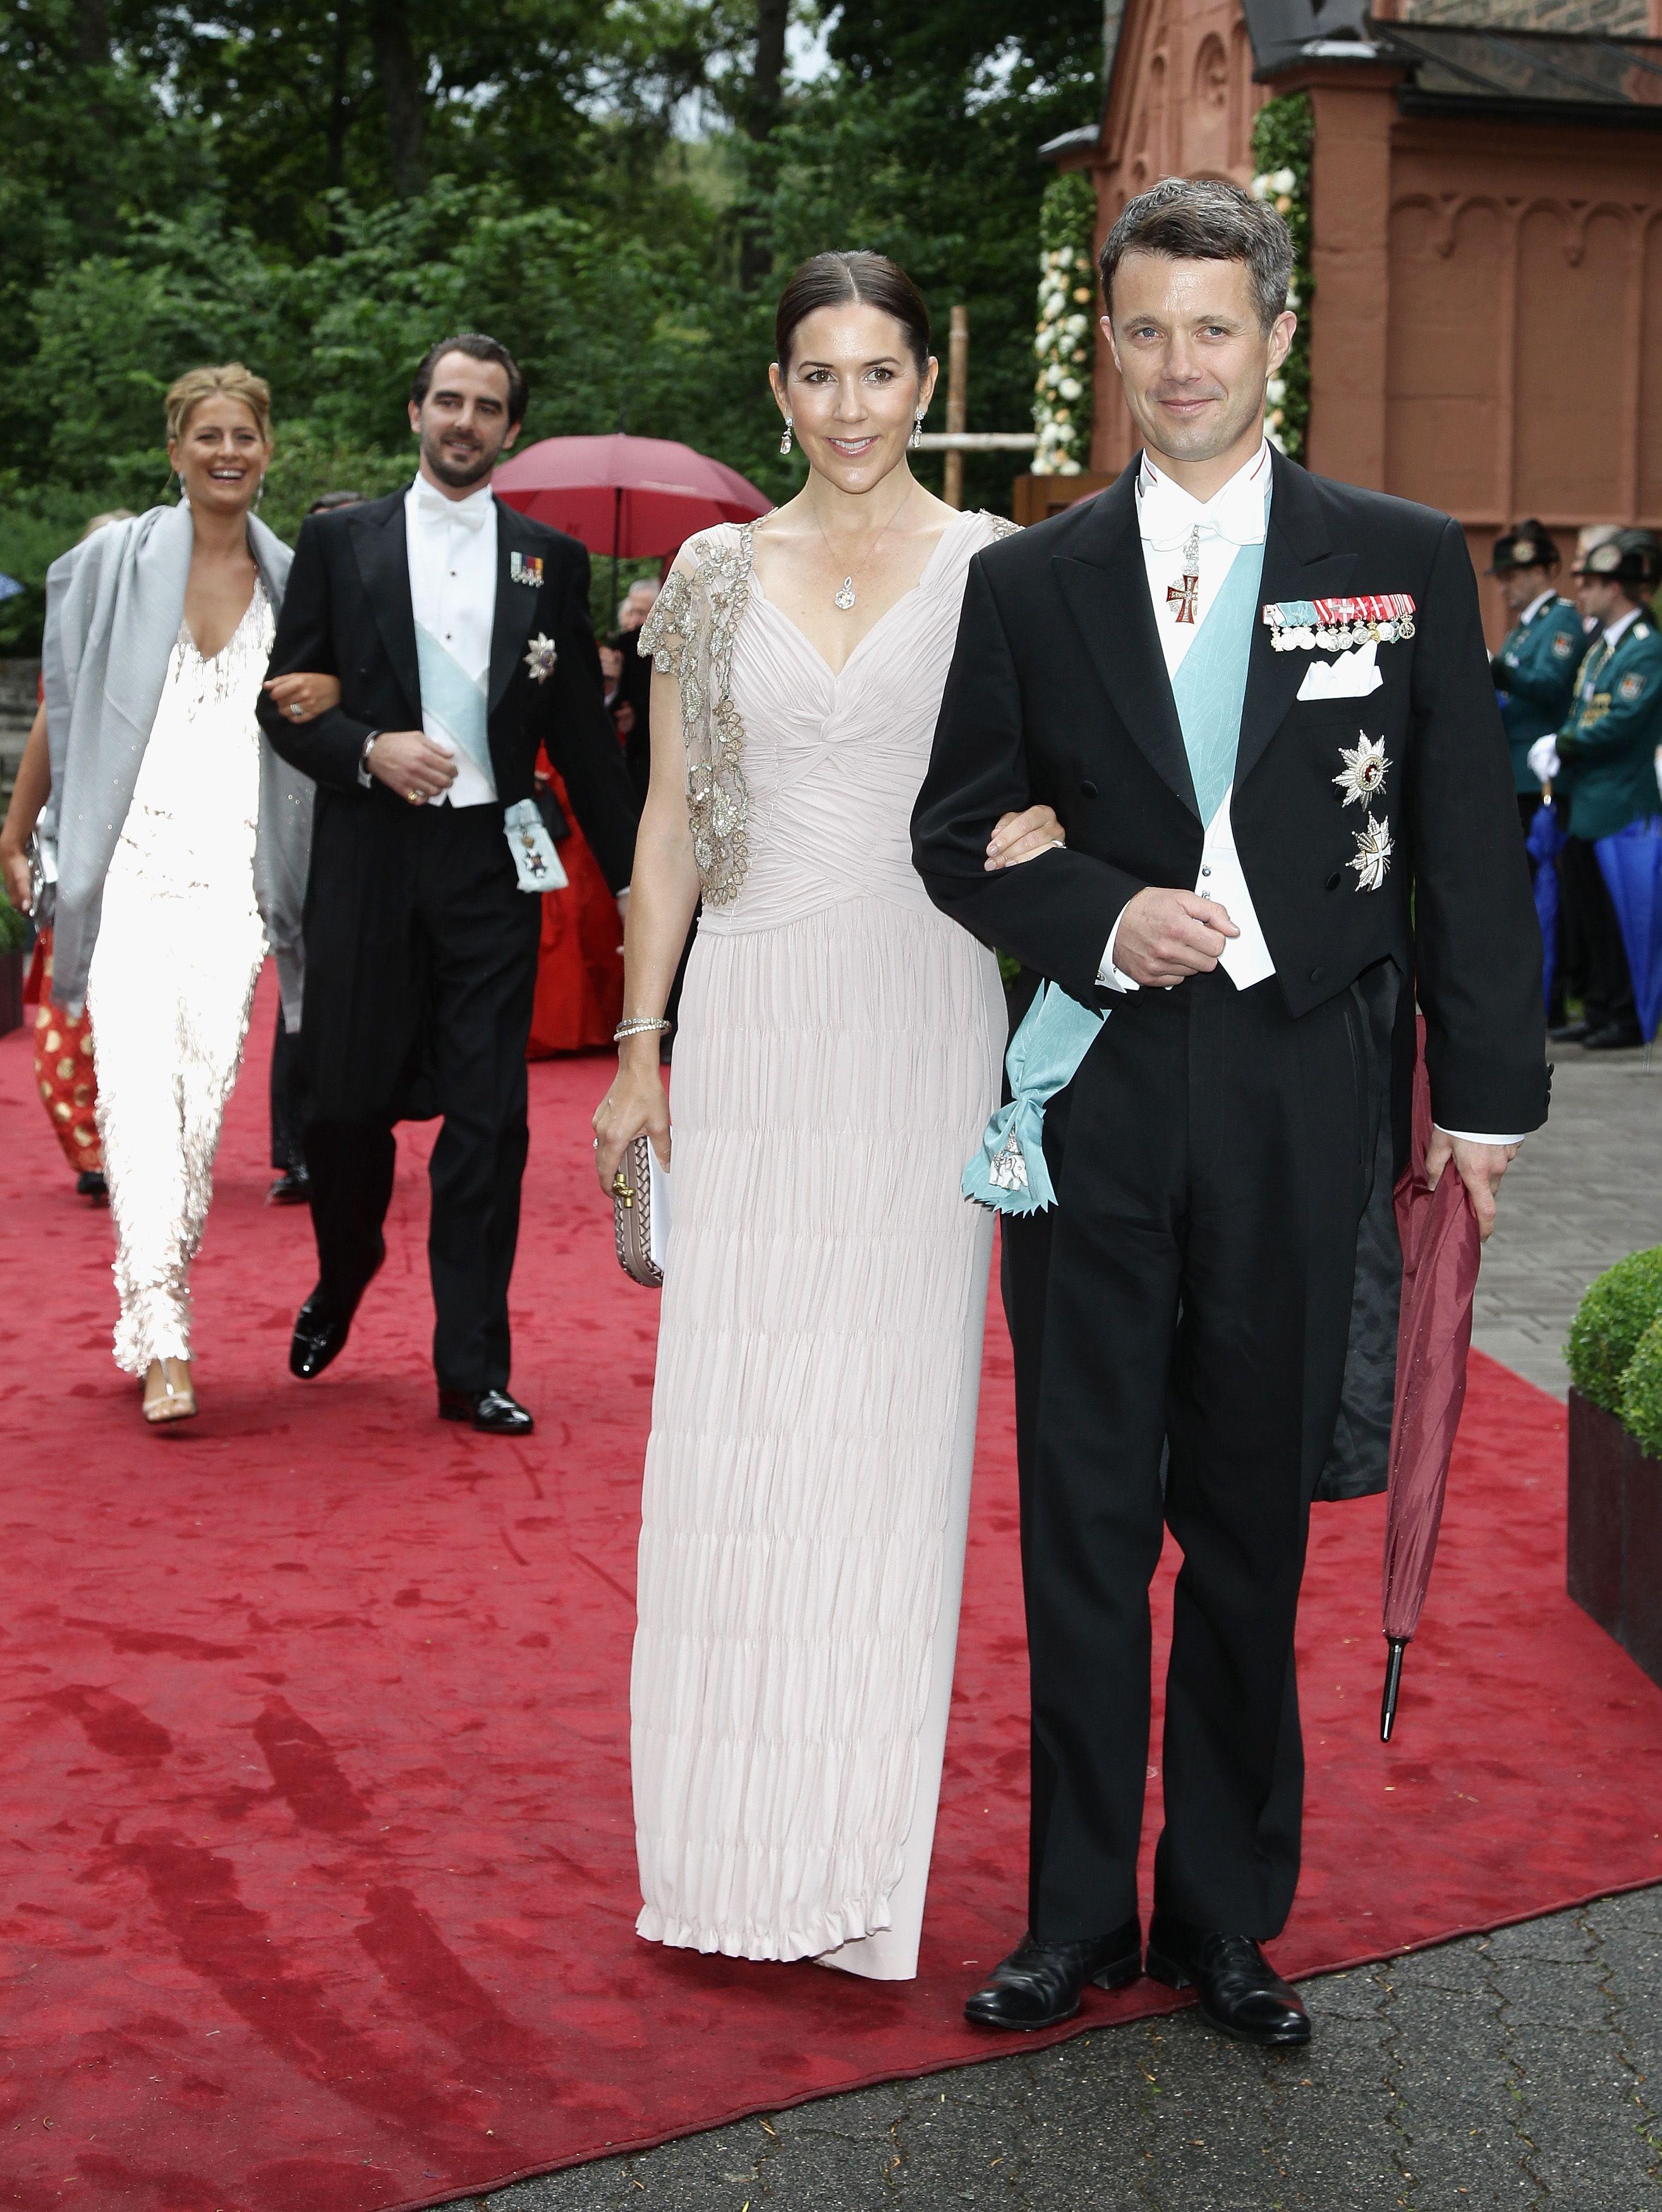 crown princess mary of denmark wedding - Google Search